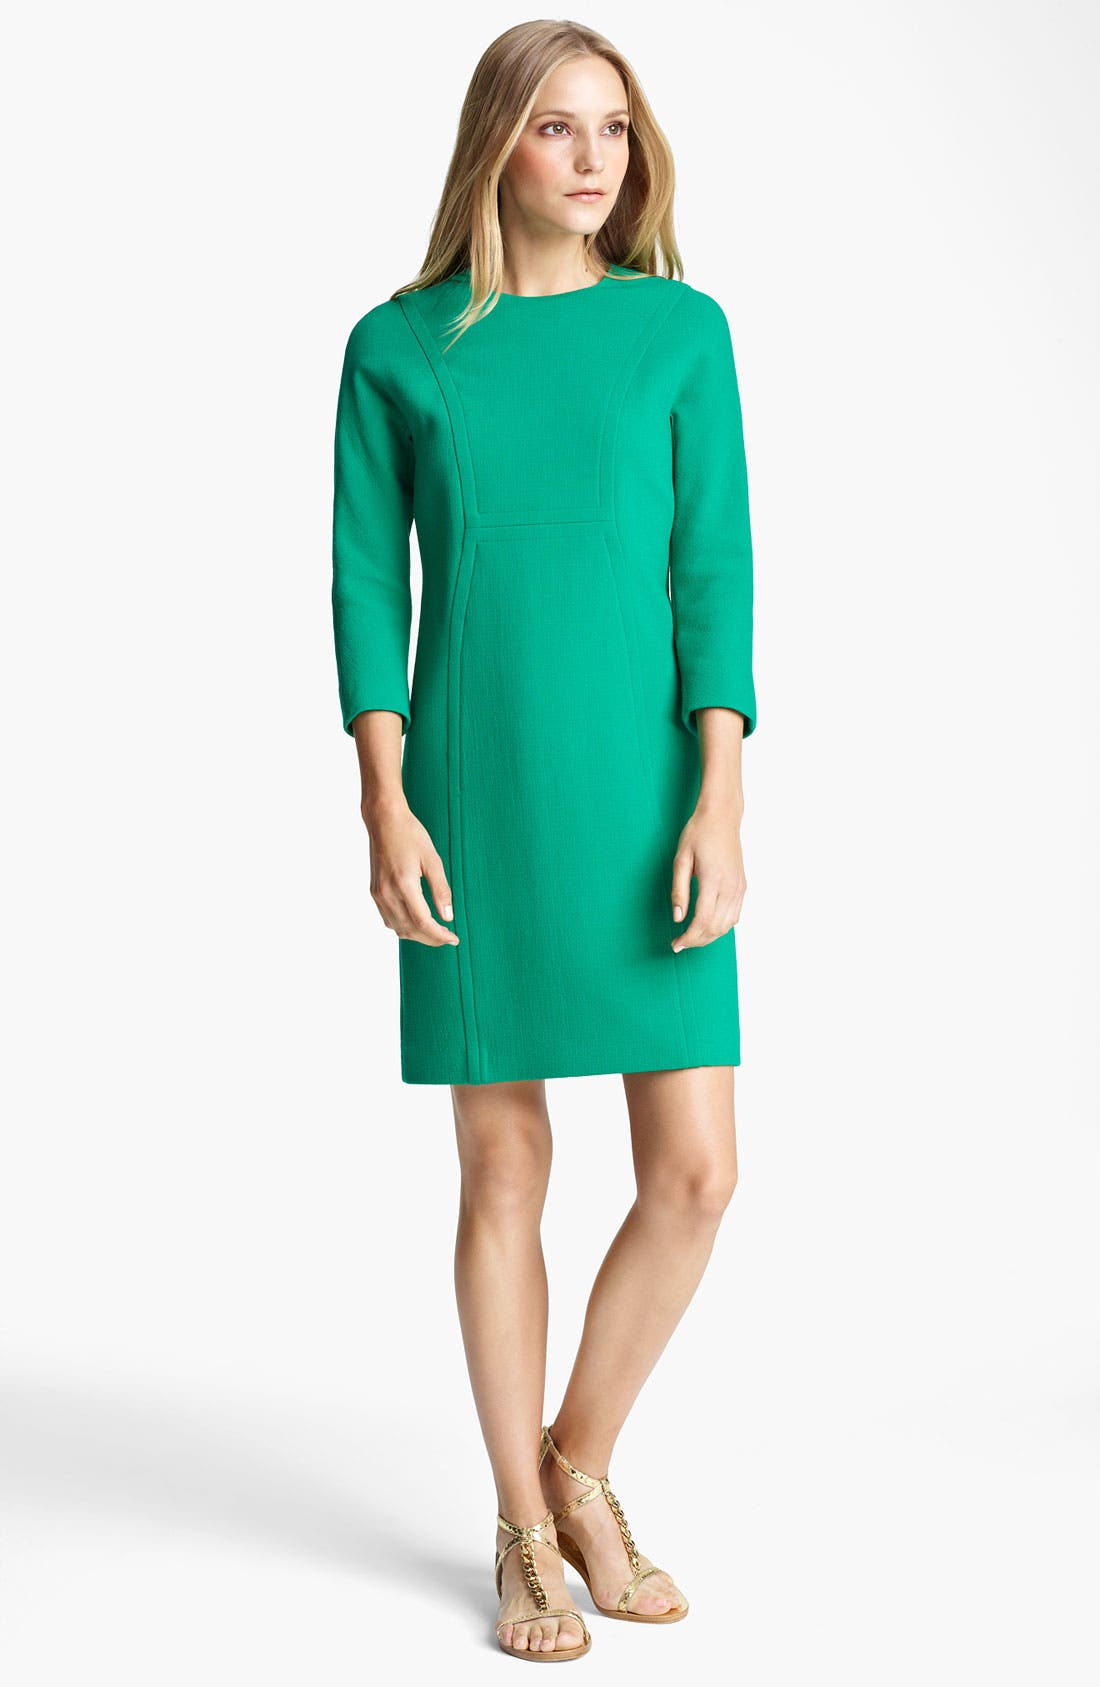 Alternate Image 1 Selected - Michael Kors Bouclé Crepe Shift Dress